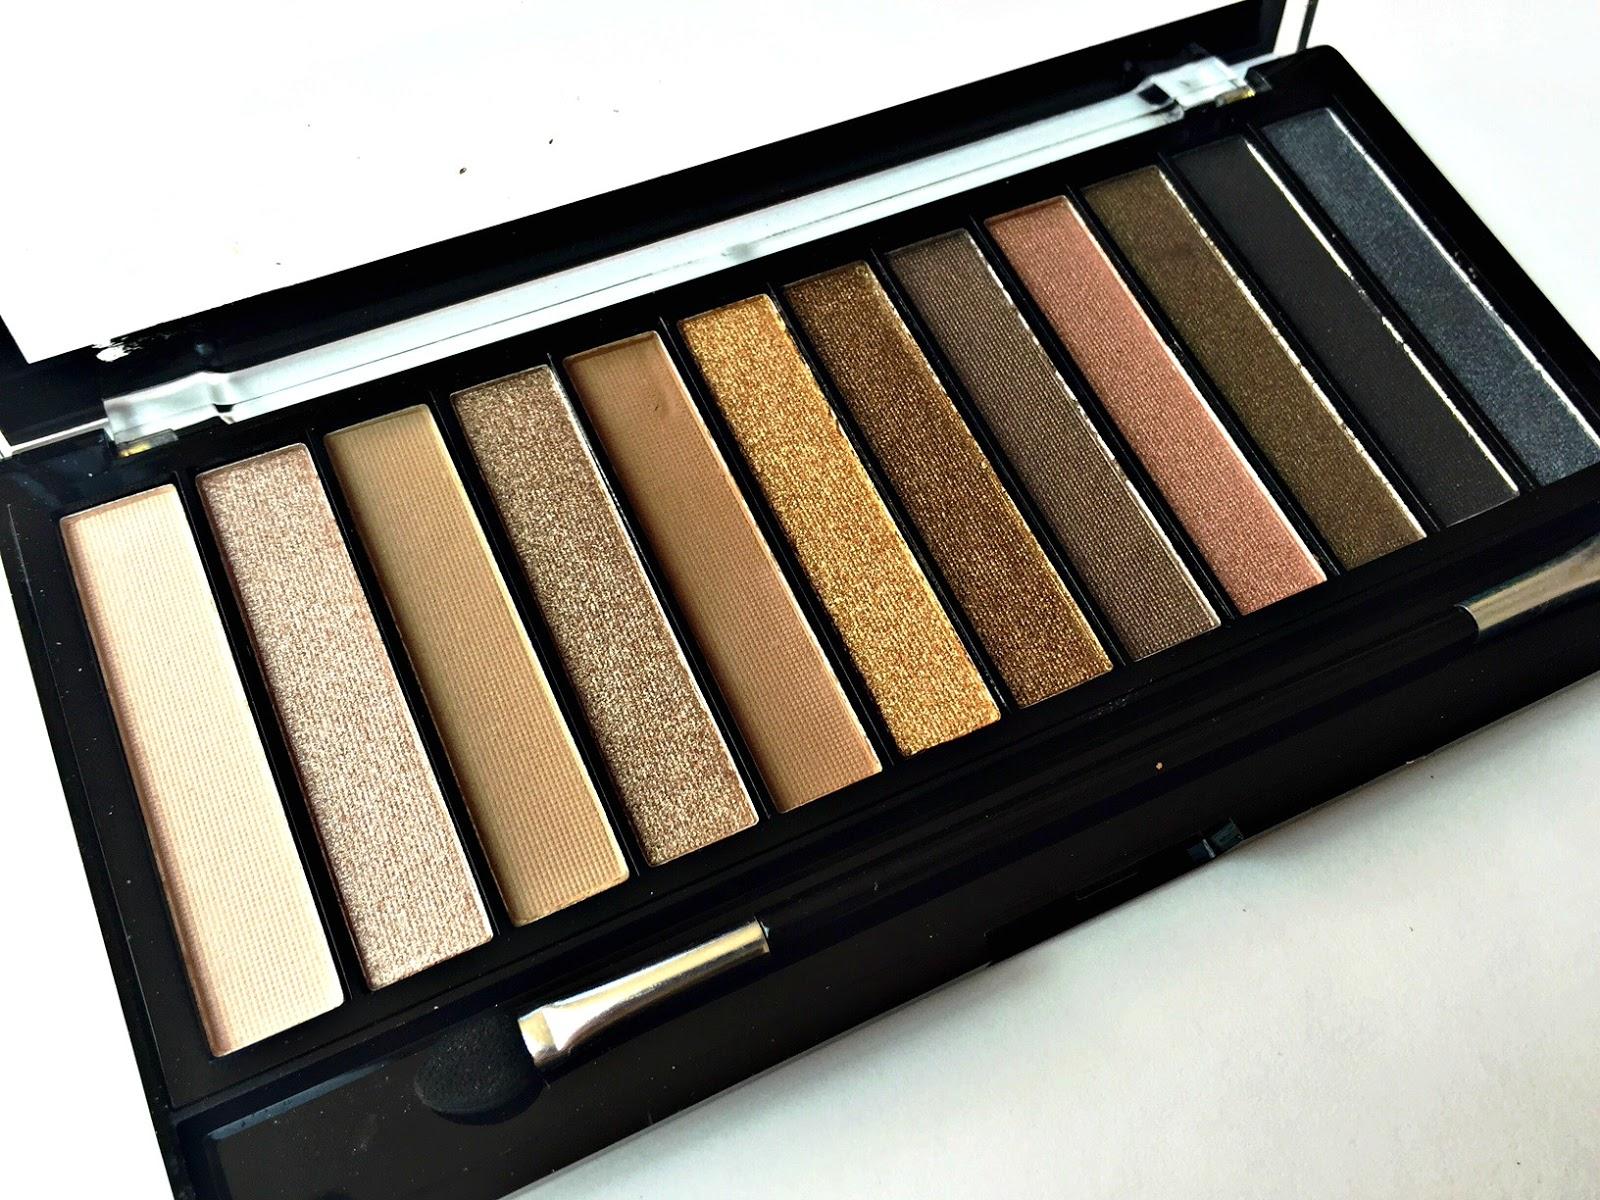 review swatches makeup revolution redemption palette. Black Bedroom Furniture Sets. Home Design Ideas